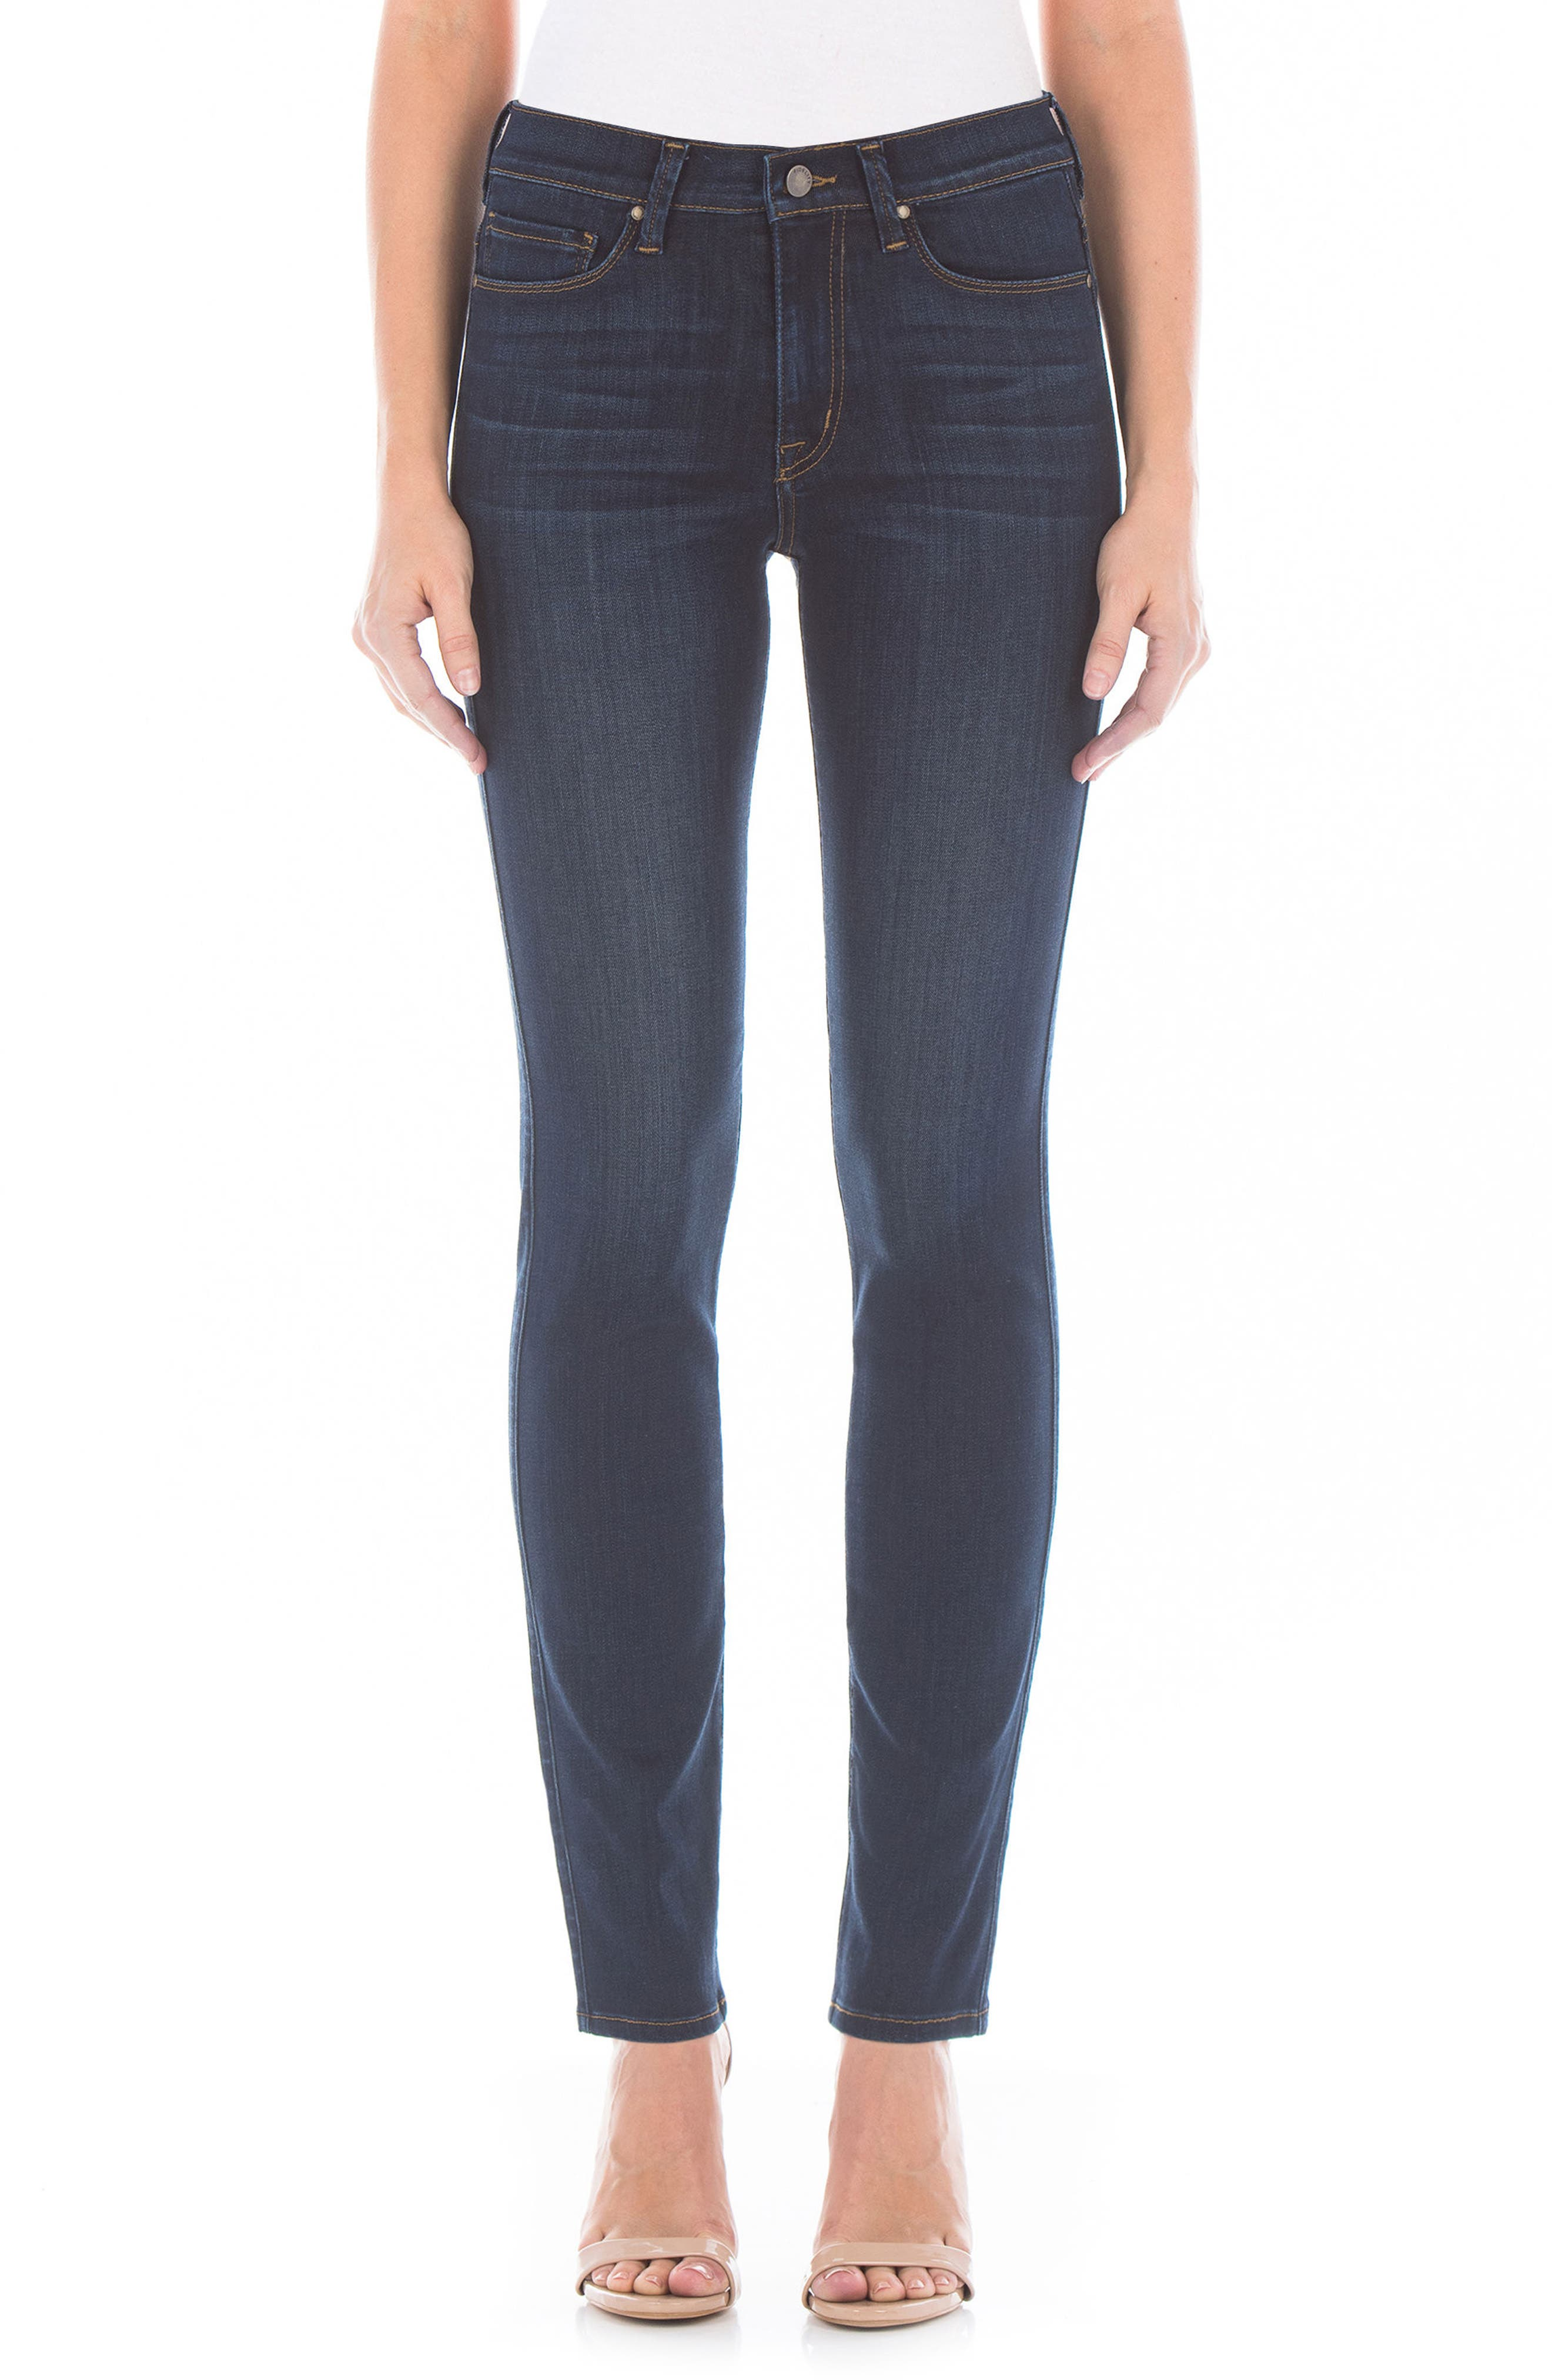 FIDELITY DENIM,                             Cher High Waist Slim Jeans,                             Main thumbnail 1, color,                             400